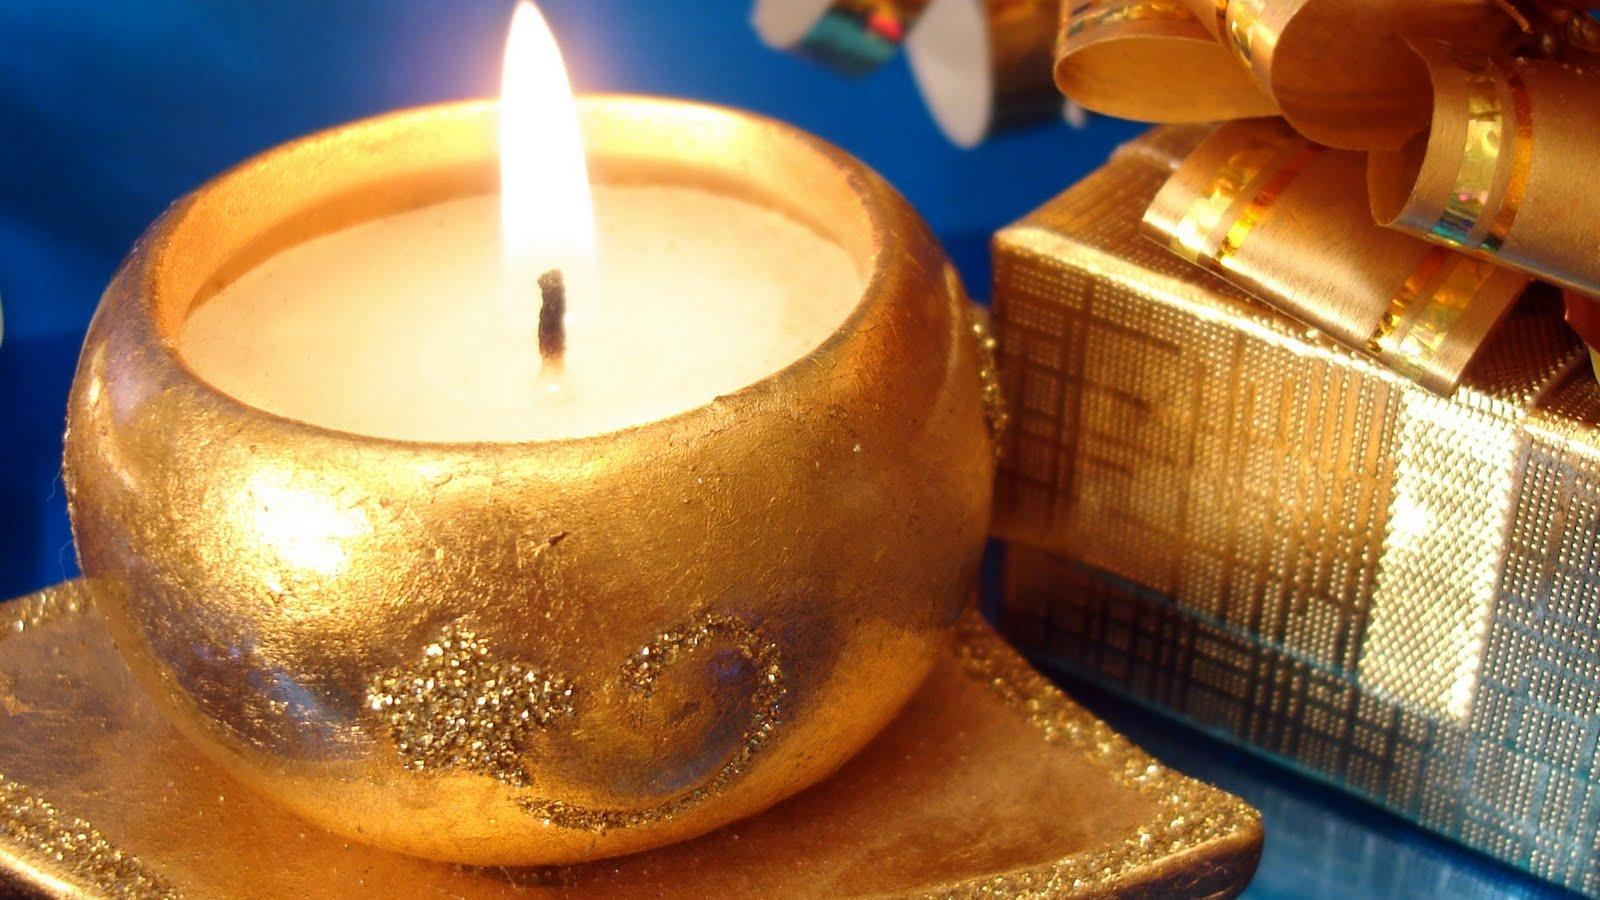 http://4.bp.blogspot.com/-slJhYtCfAXk/Tn7qJT9i01I/AAAAAAAAAus/DQvSW8DiehA/s1600/Christmas%2BGreeting%2BCards%2BWallpapers.jpg